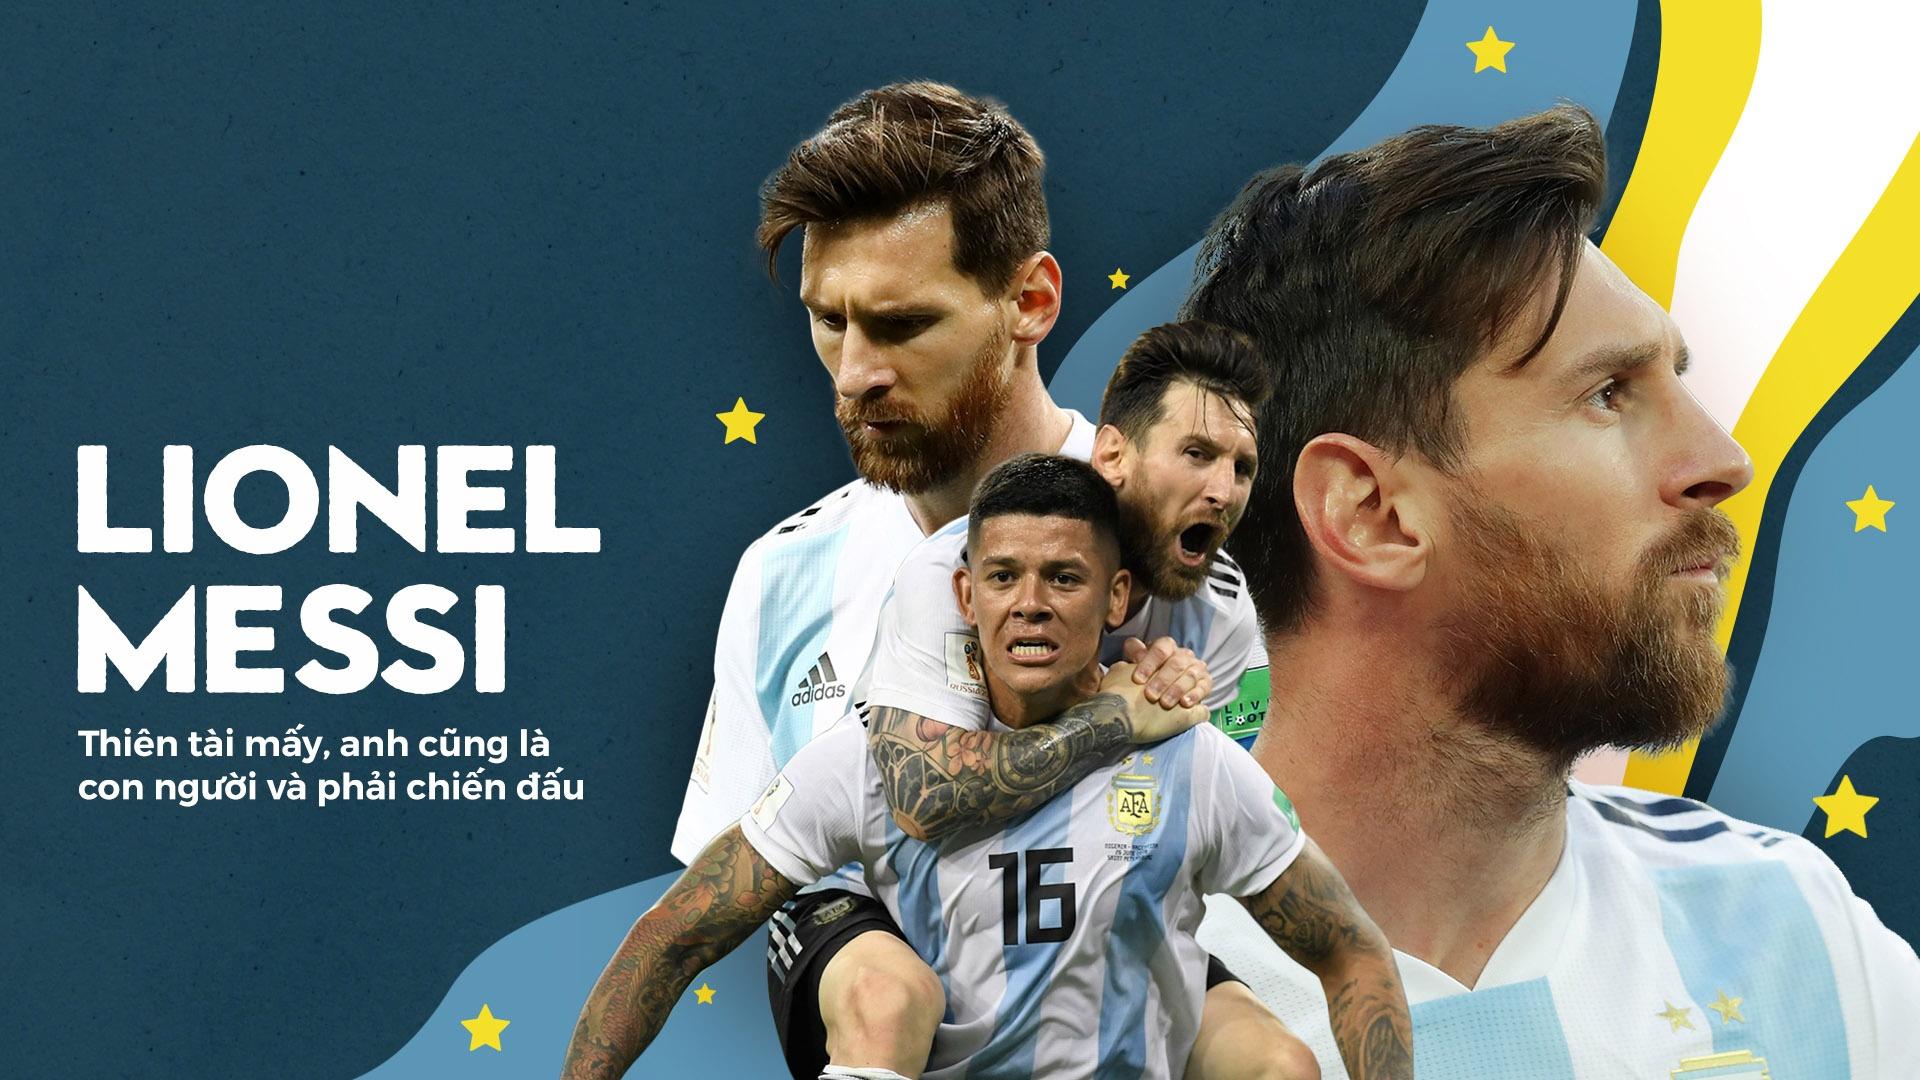 Lionel Messi: Thien tai may, anh cung la con nguoi, va phai chien dau hinh anh 2